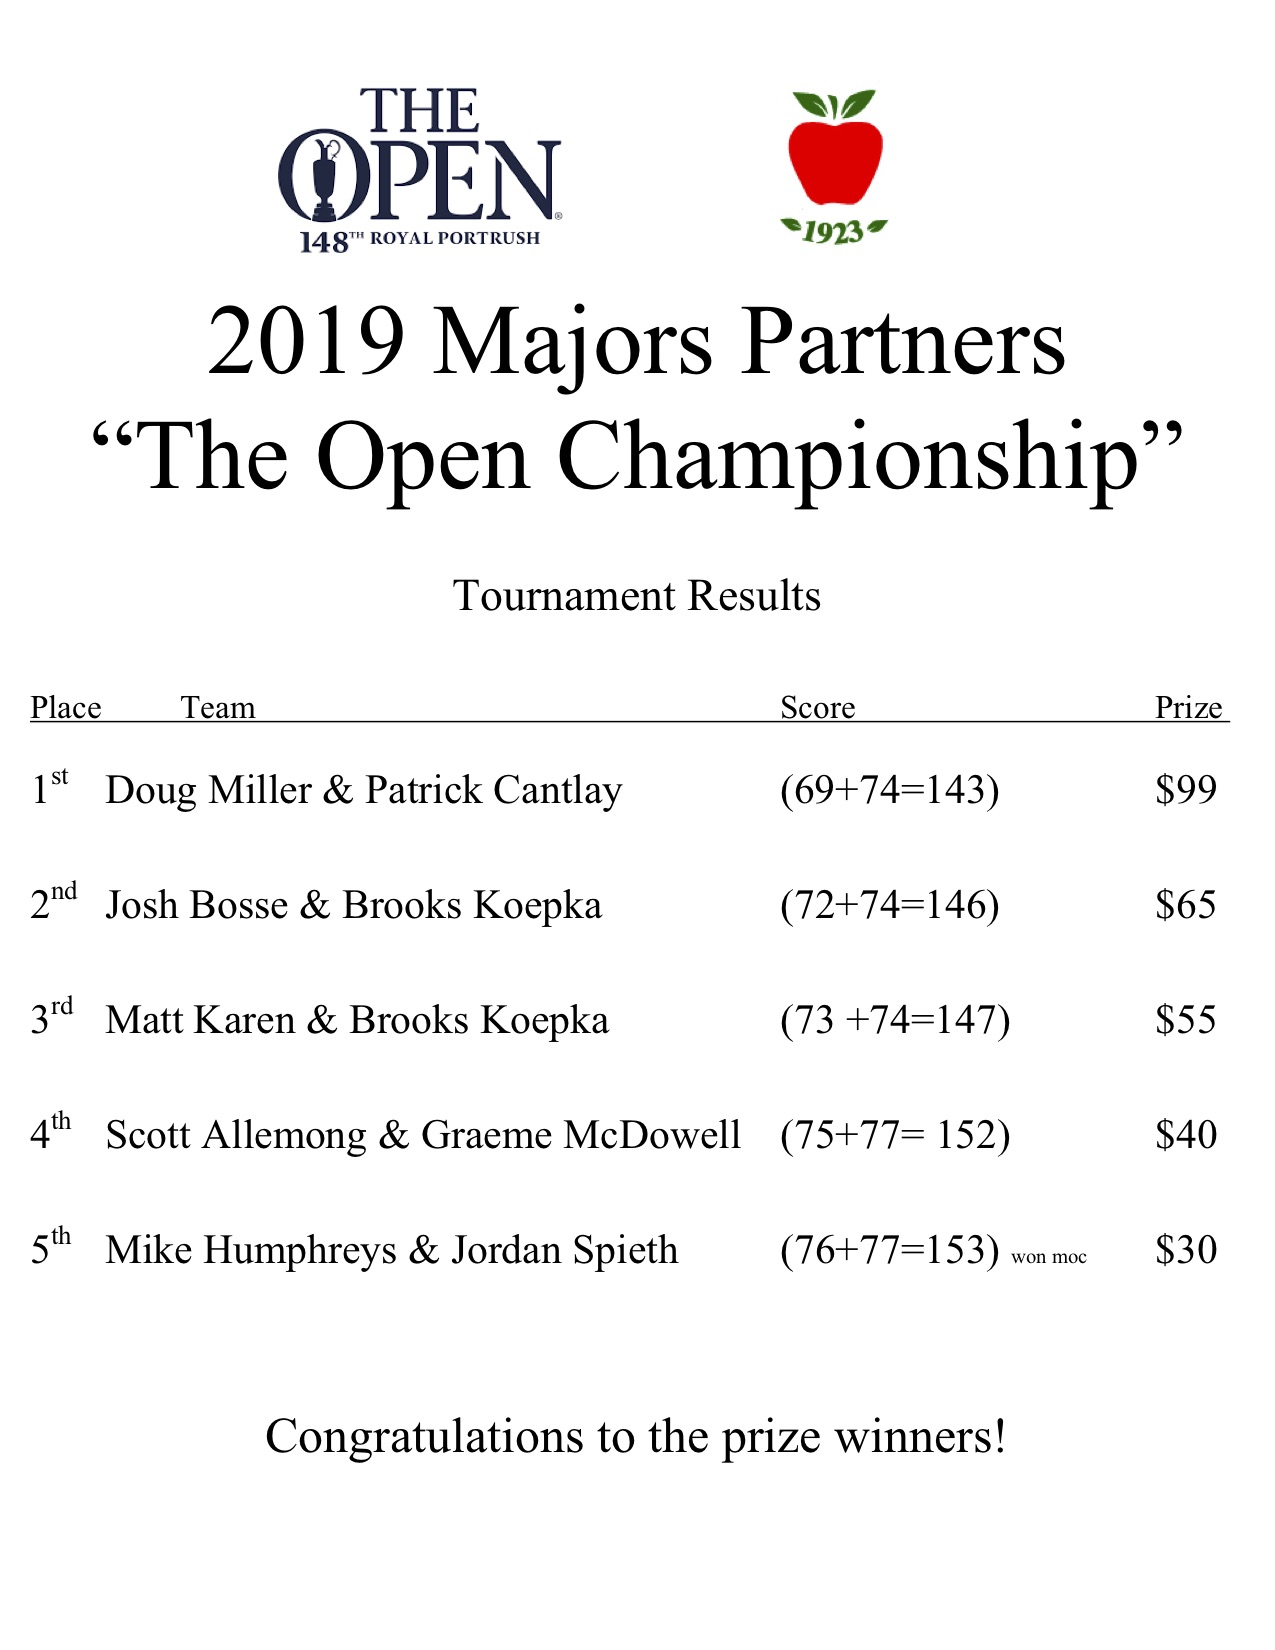 2019 open championship majors partners results.jpg